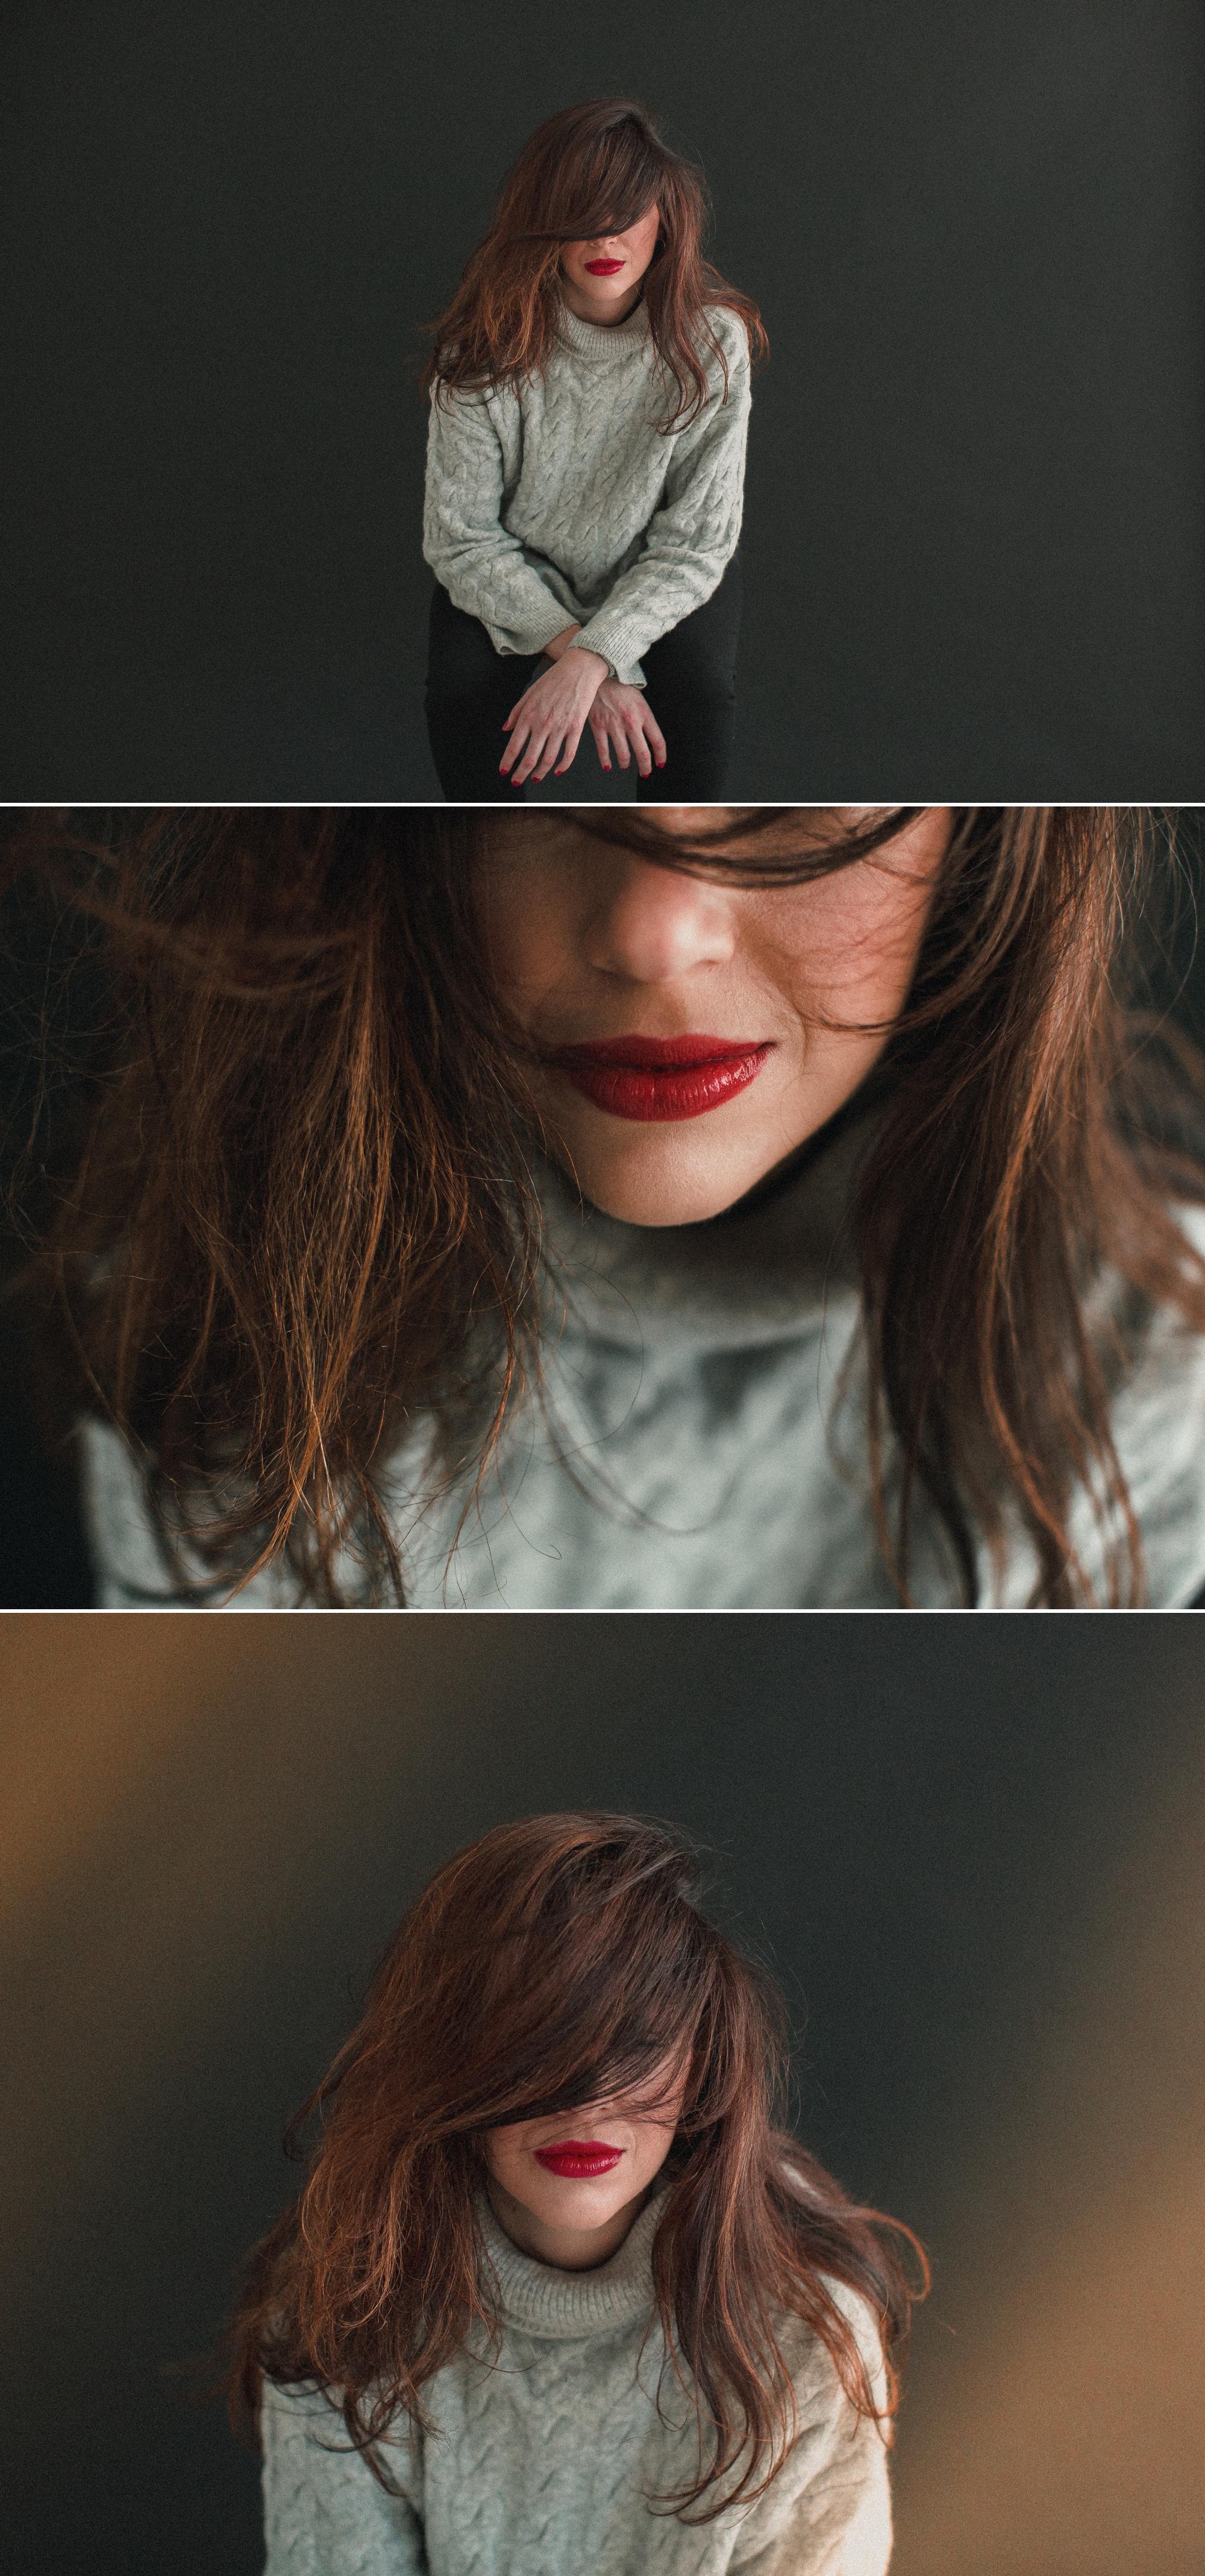 lifestyle-fashion-studio-portrait 8.jpg